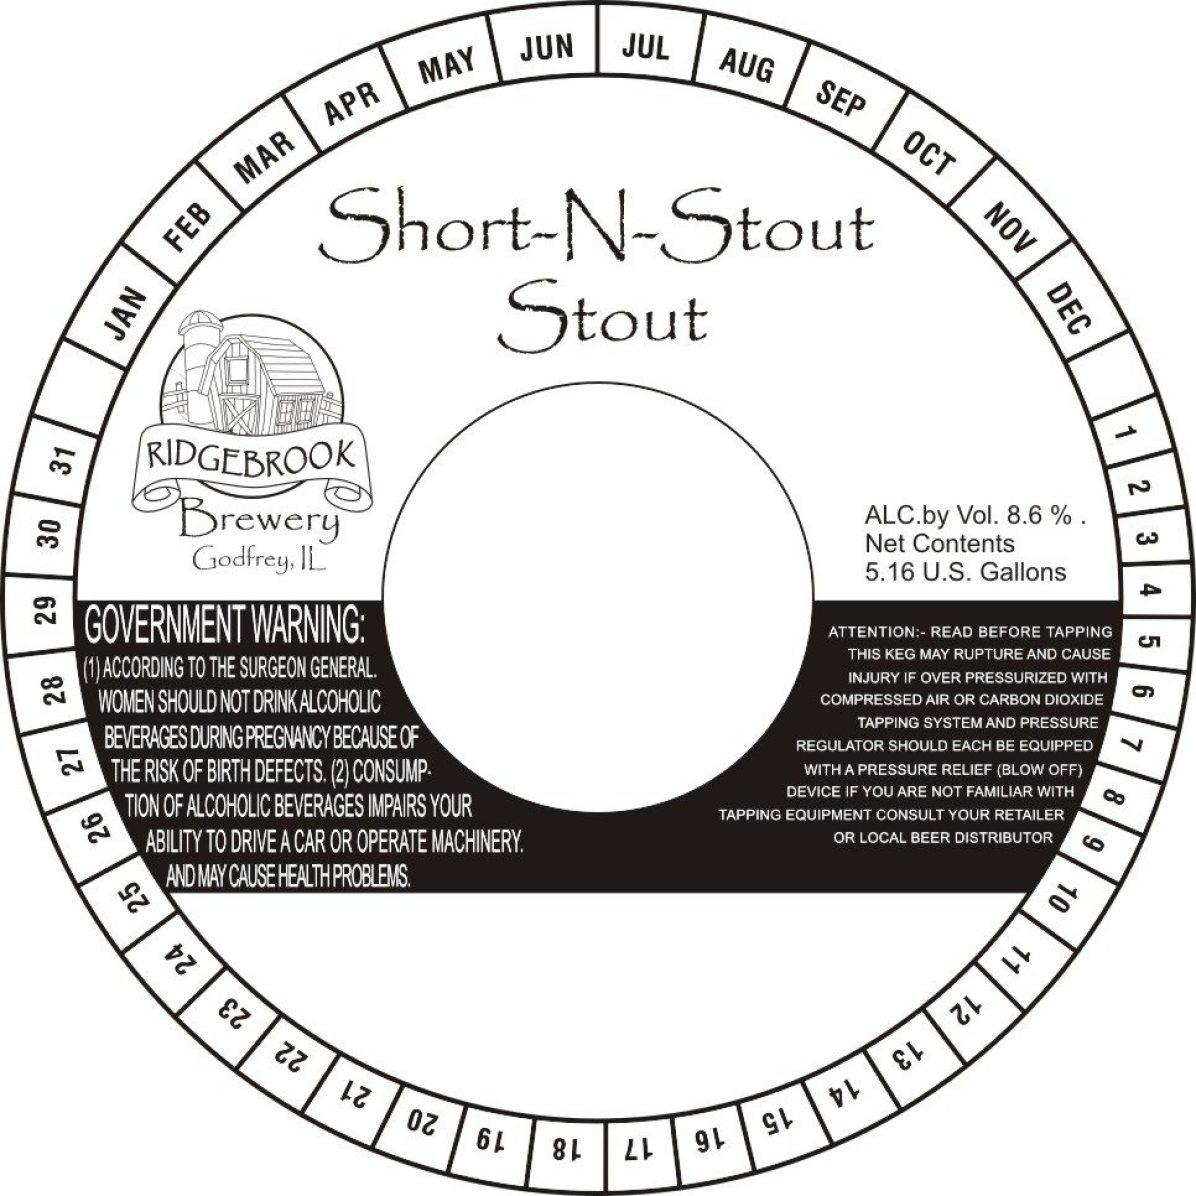 Ridgebrook Brewery Short -N-Stout